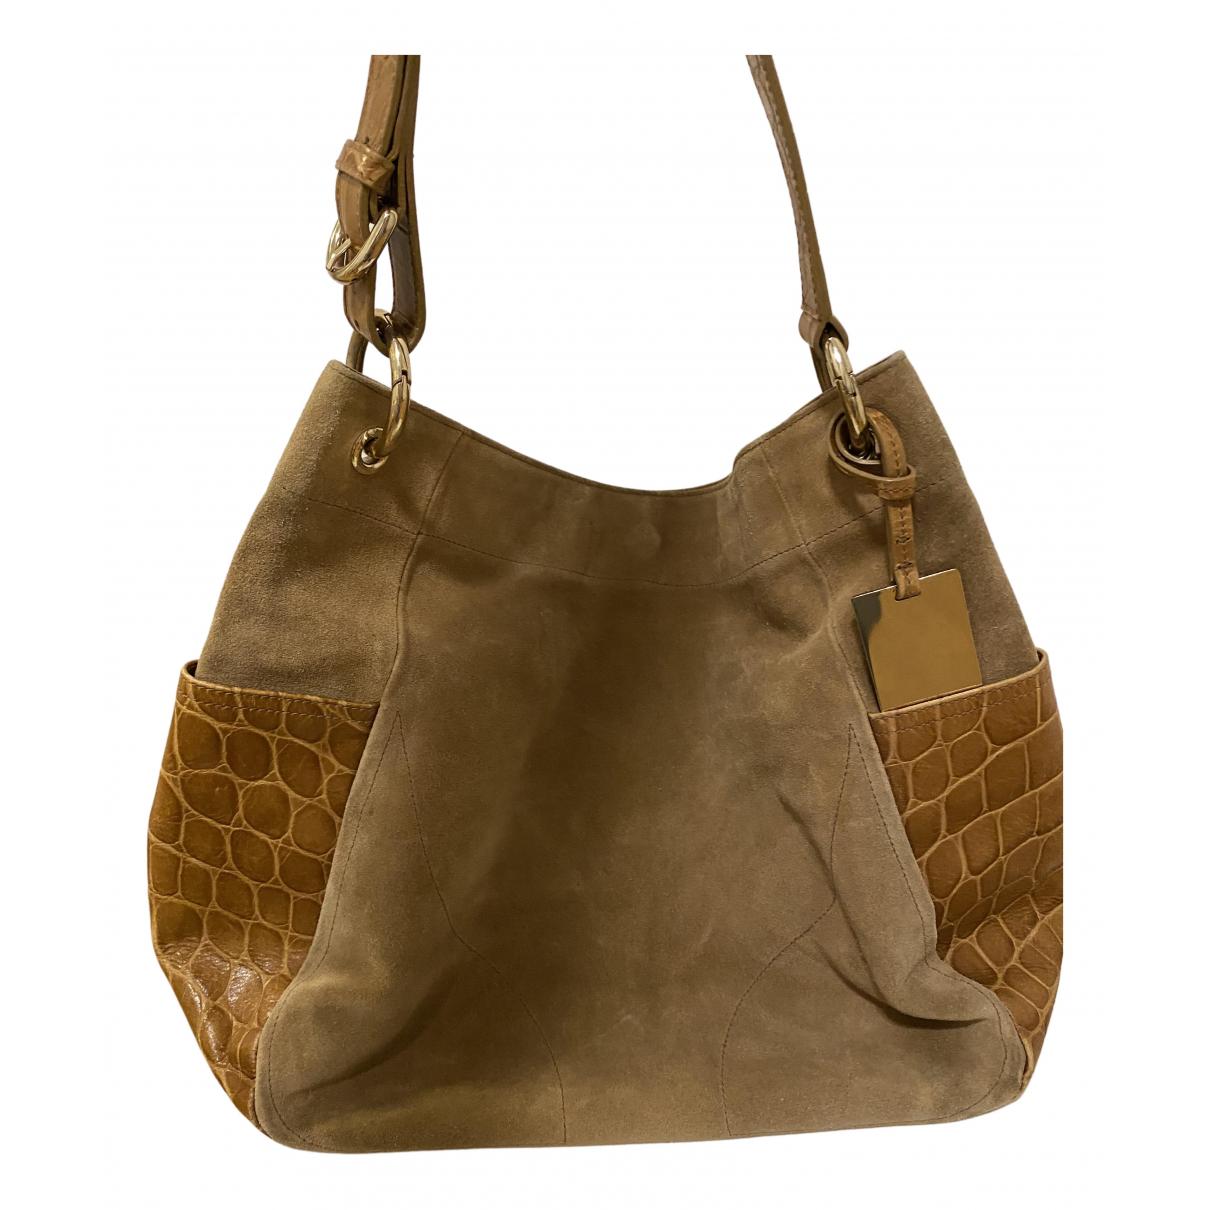 Furla N Camel Suede handbag for Women N